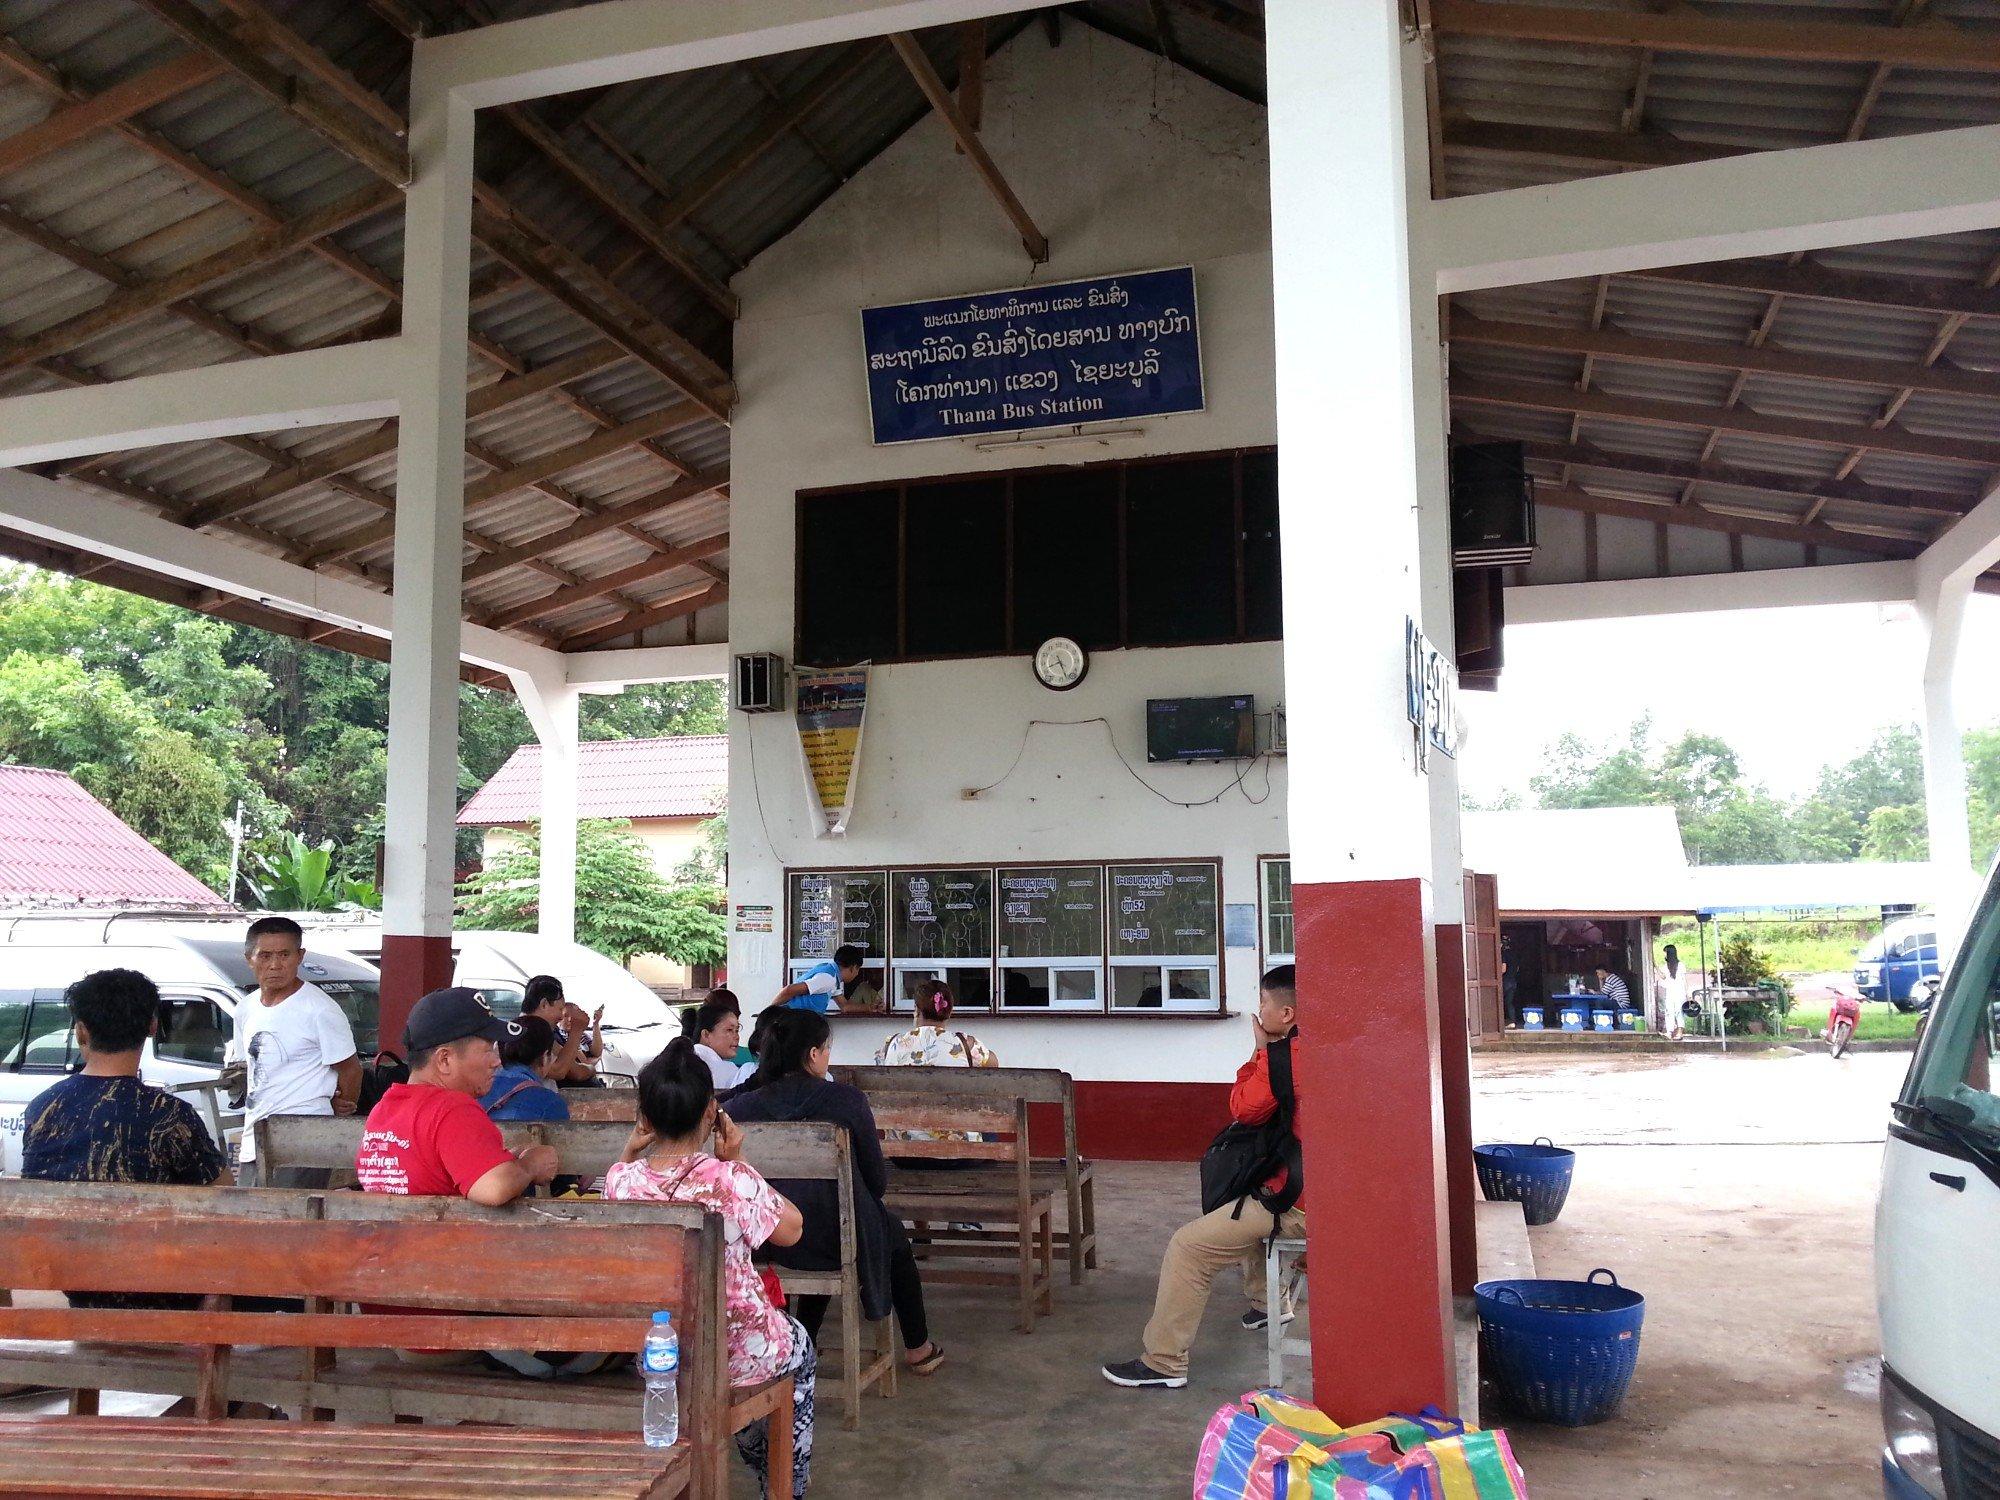 Waiting area at Xayaboury North Bus Station